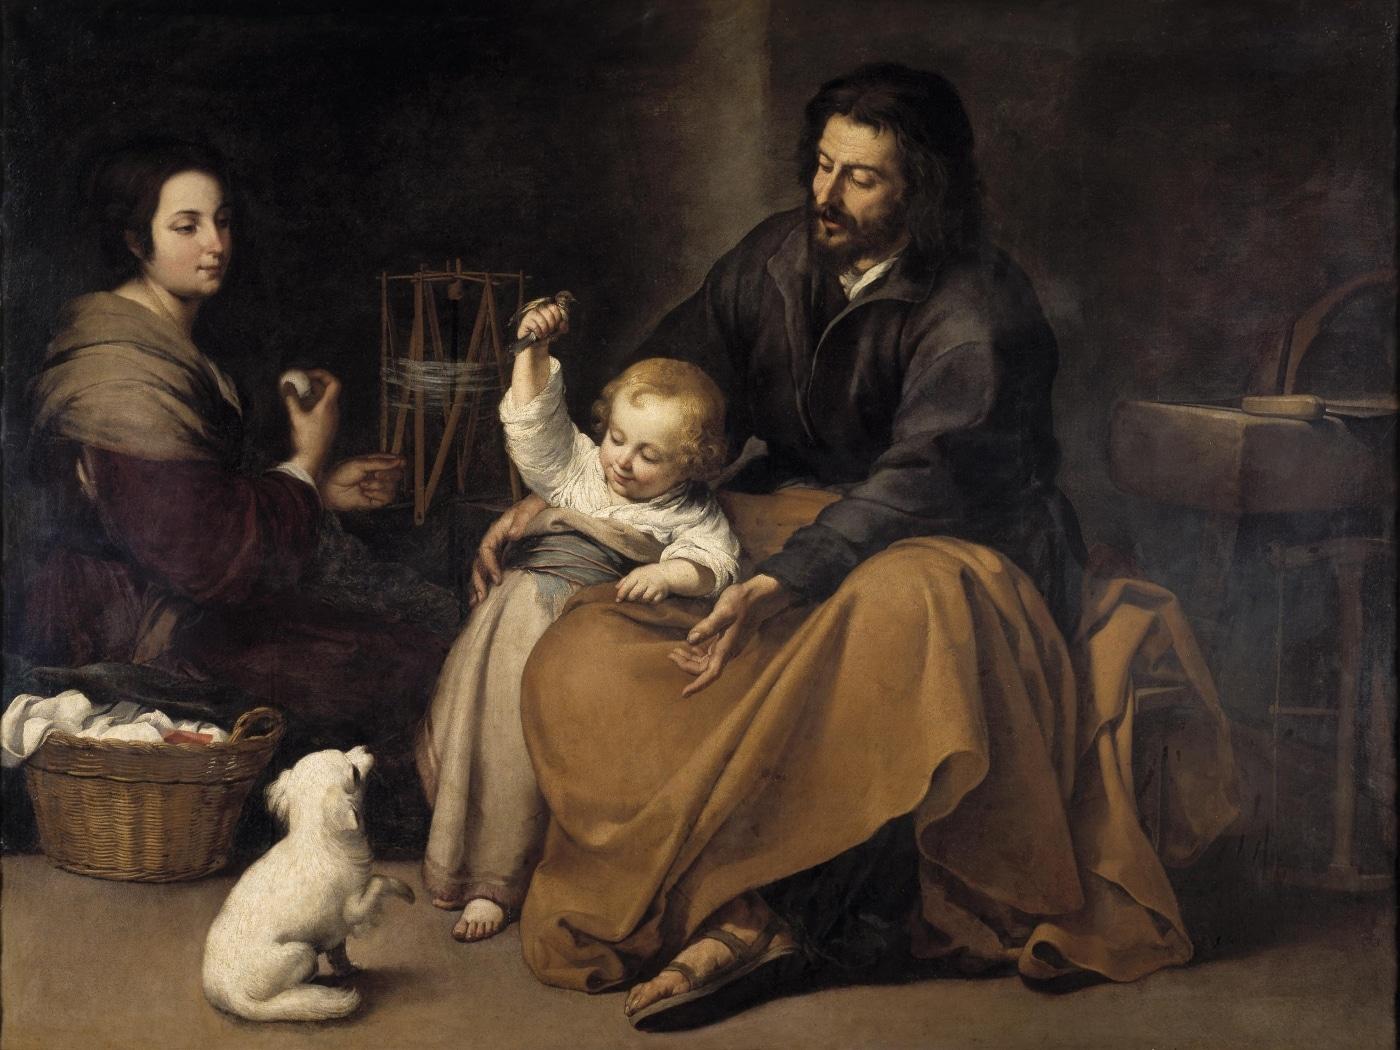 Sagrada Familia del pajarito de Bartolomé Esteban Murillo